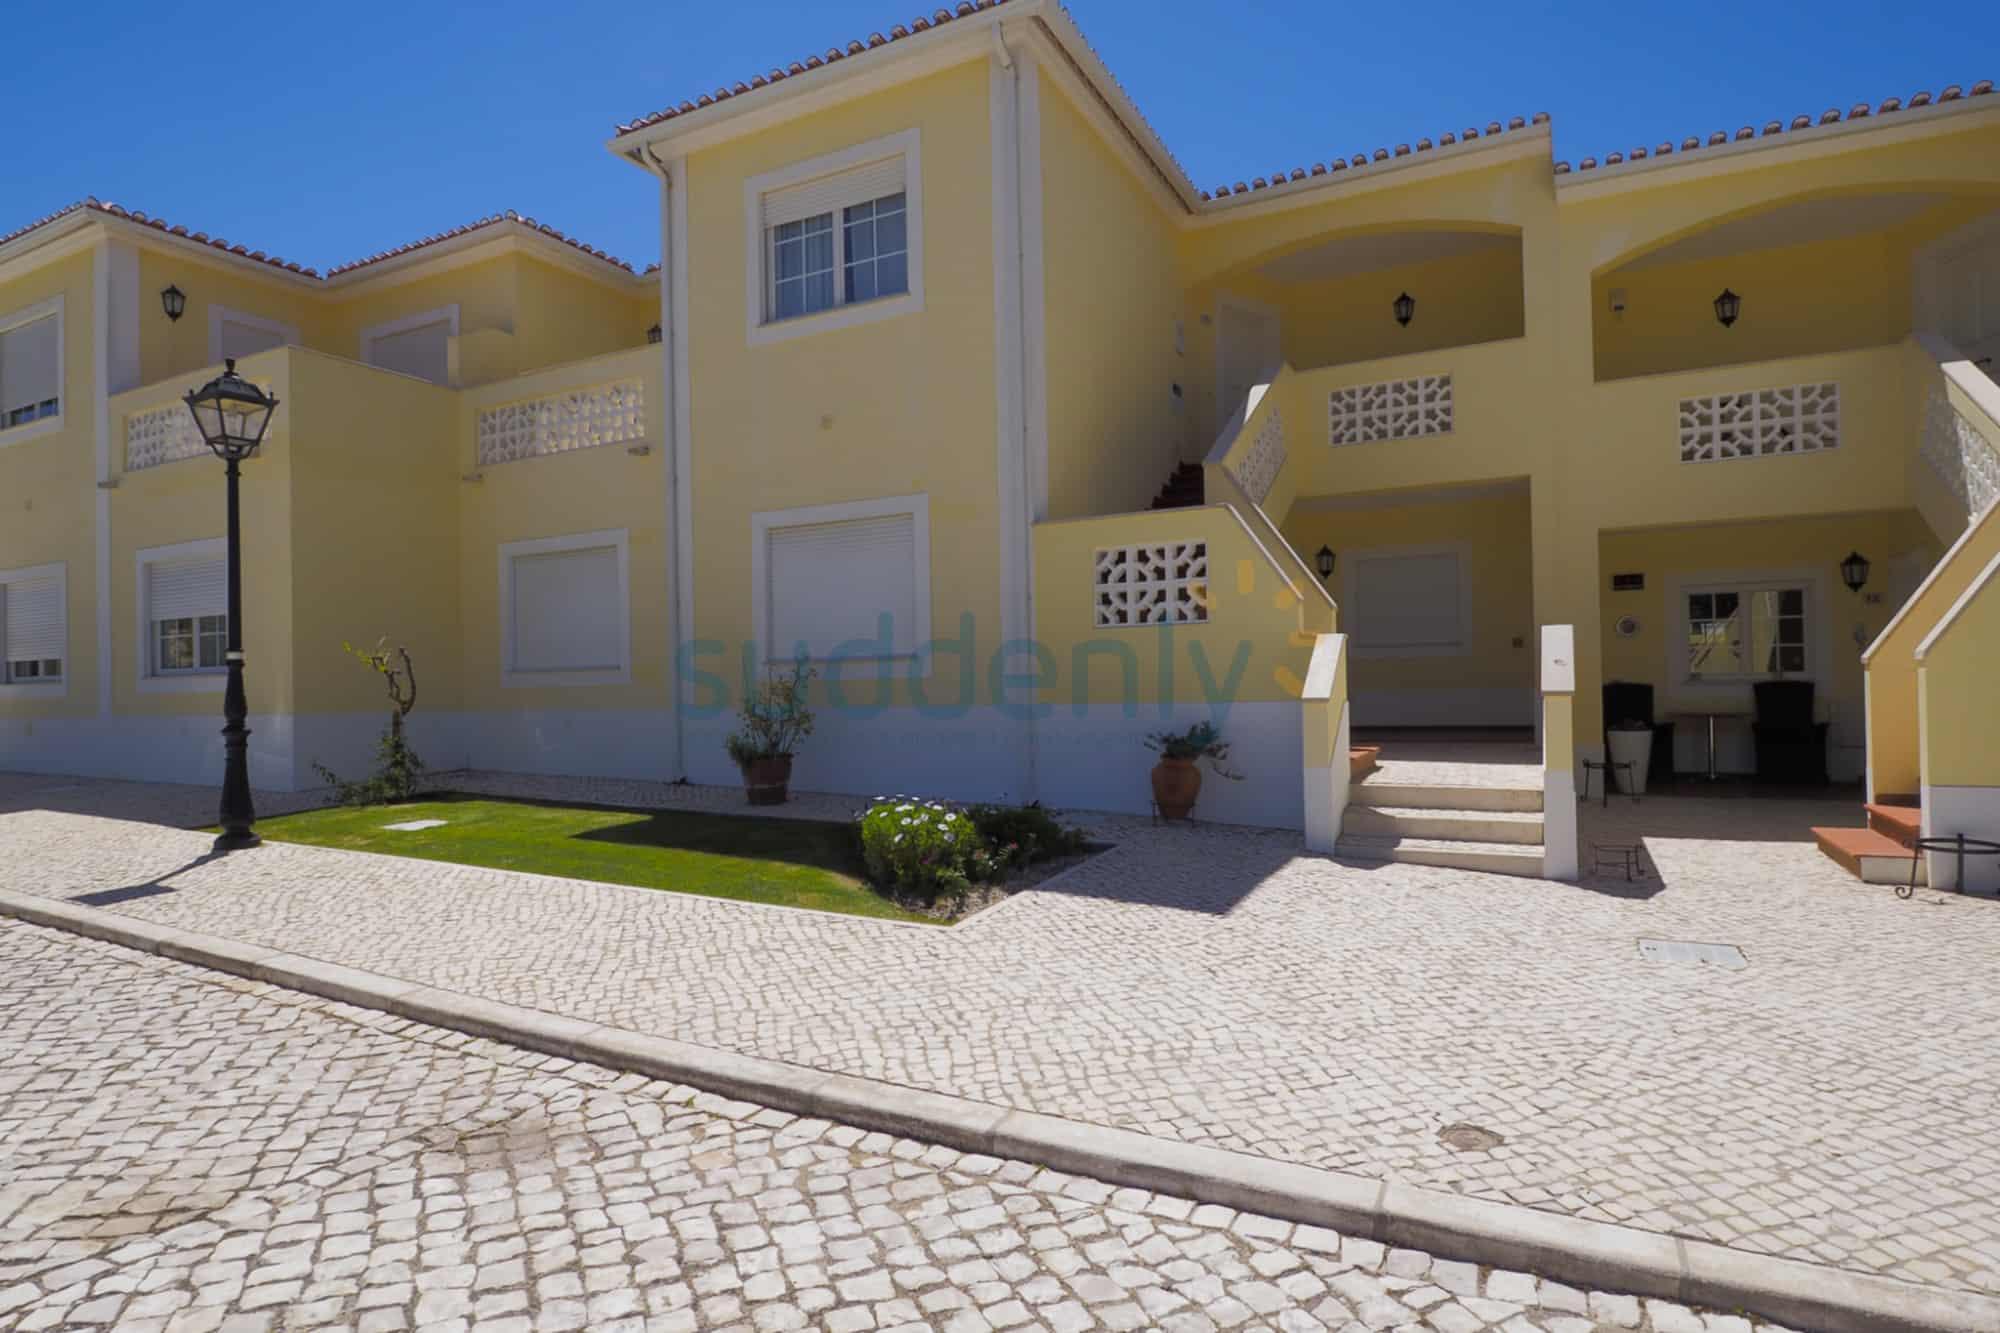 67584/AL - 15 Afonso Praia D'El Rey 4